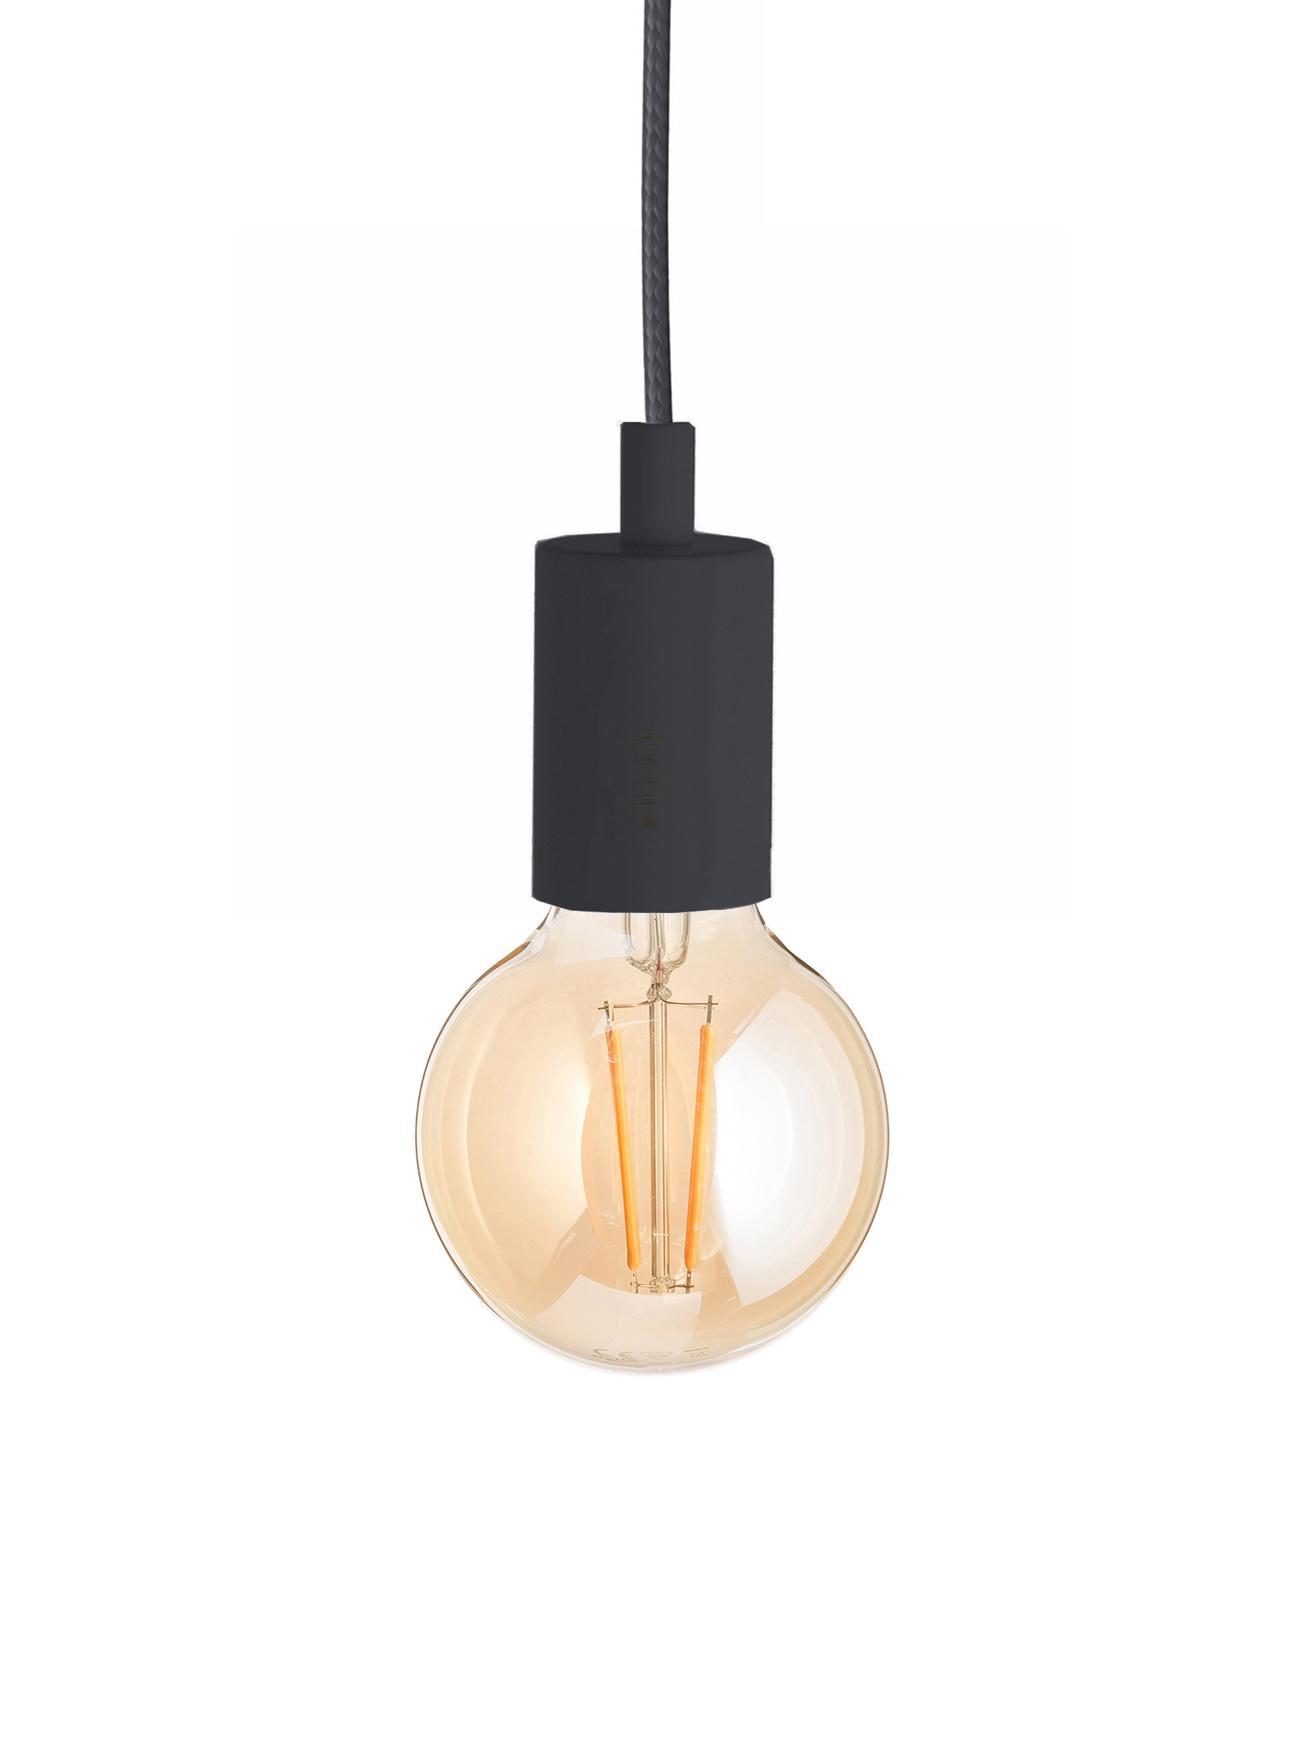 Lampada a sospensione Color, Nero, Ø 5 x Alt. 6 cm